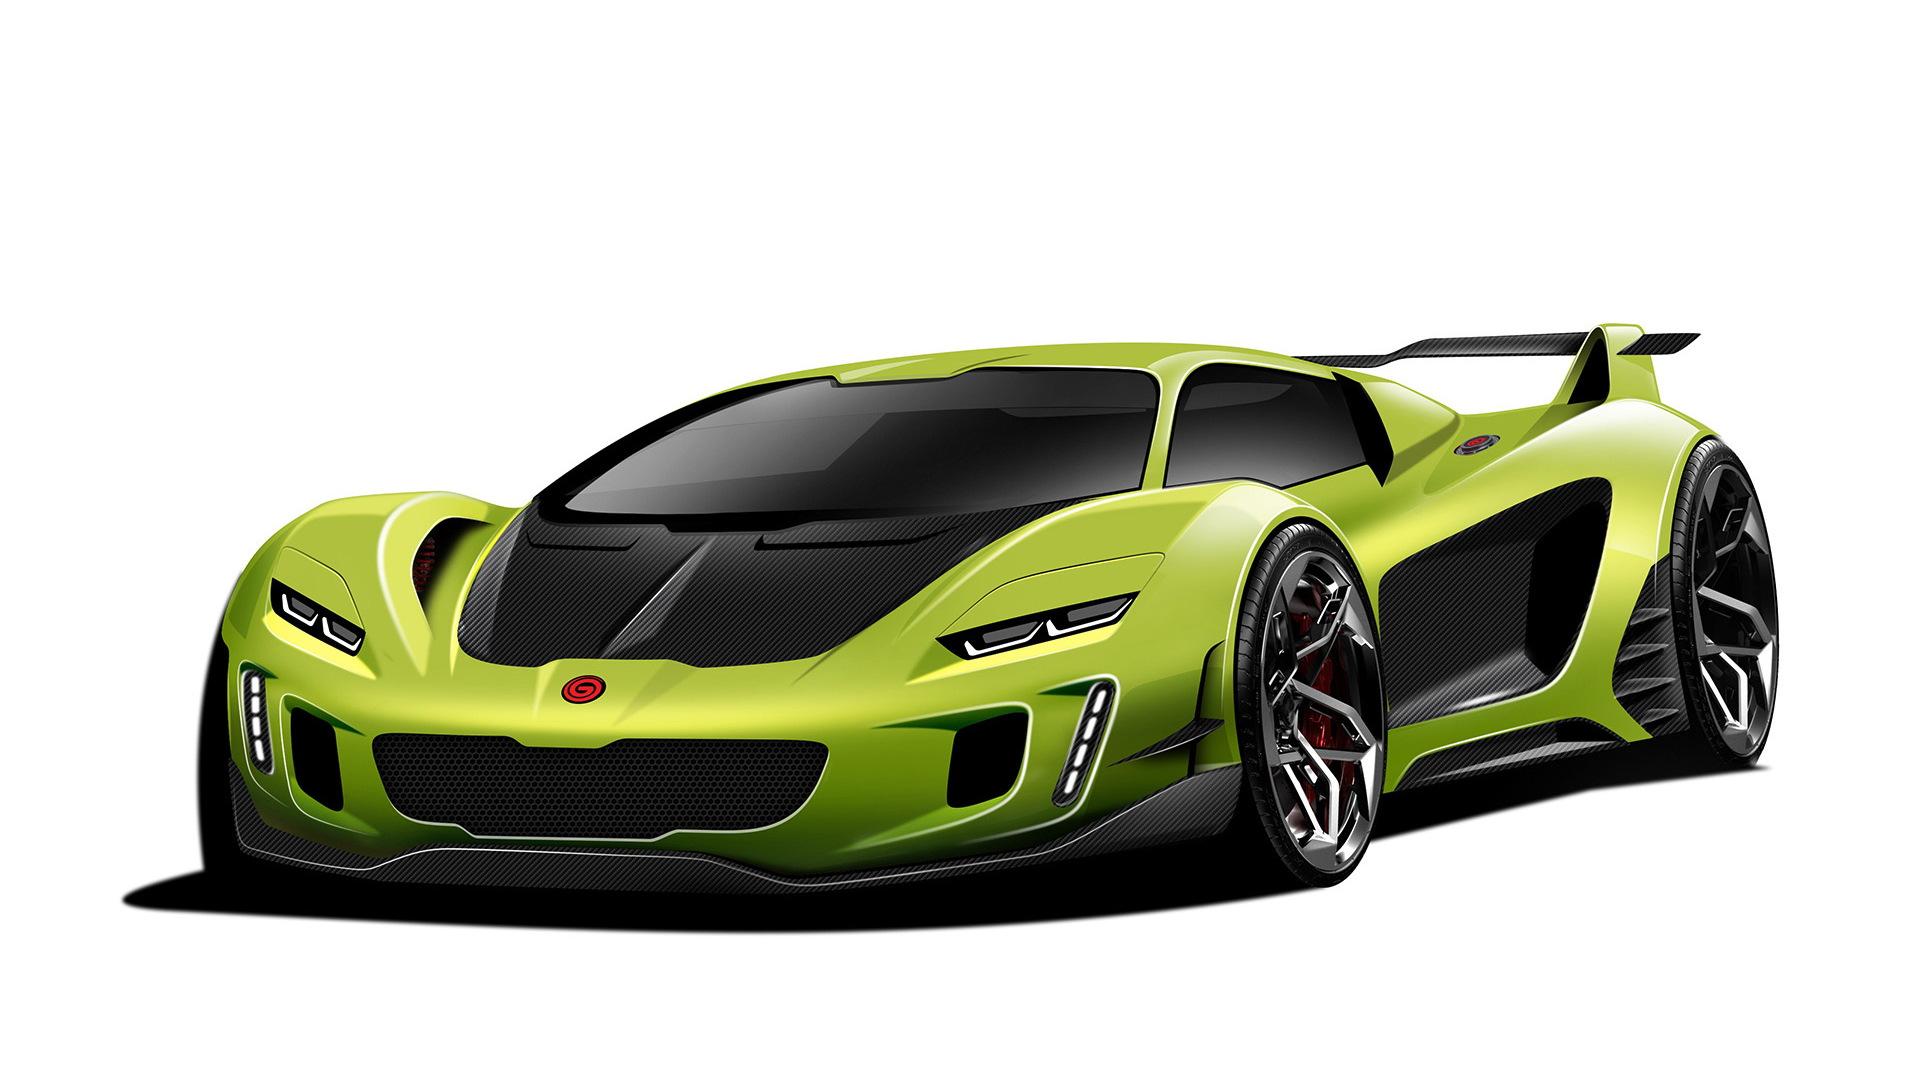 Teaser for Gemballa supercar